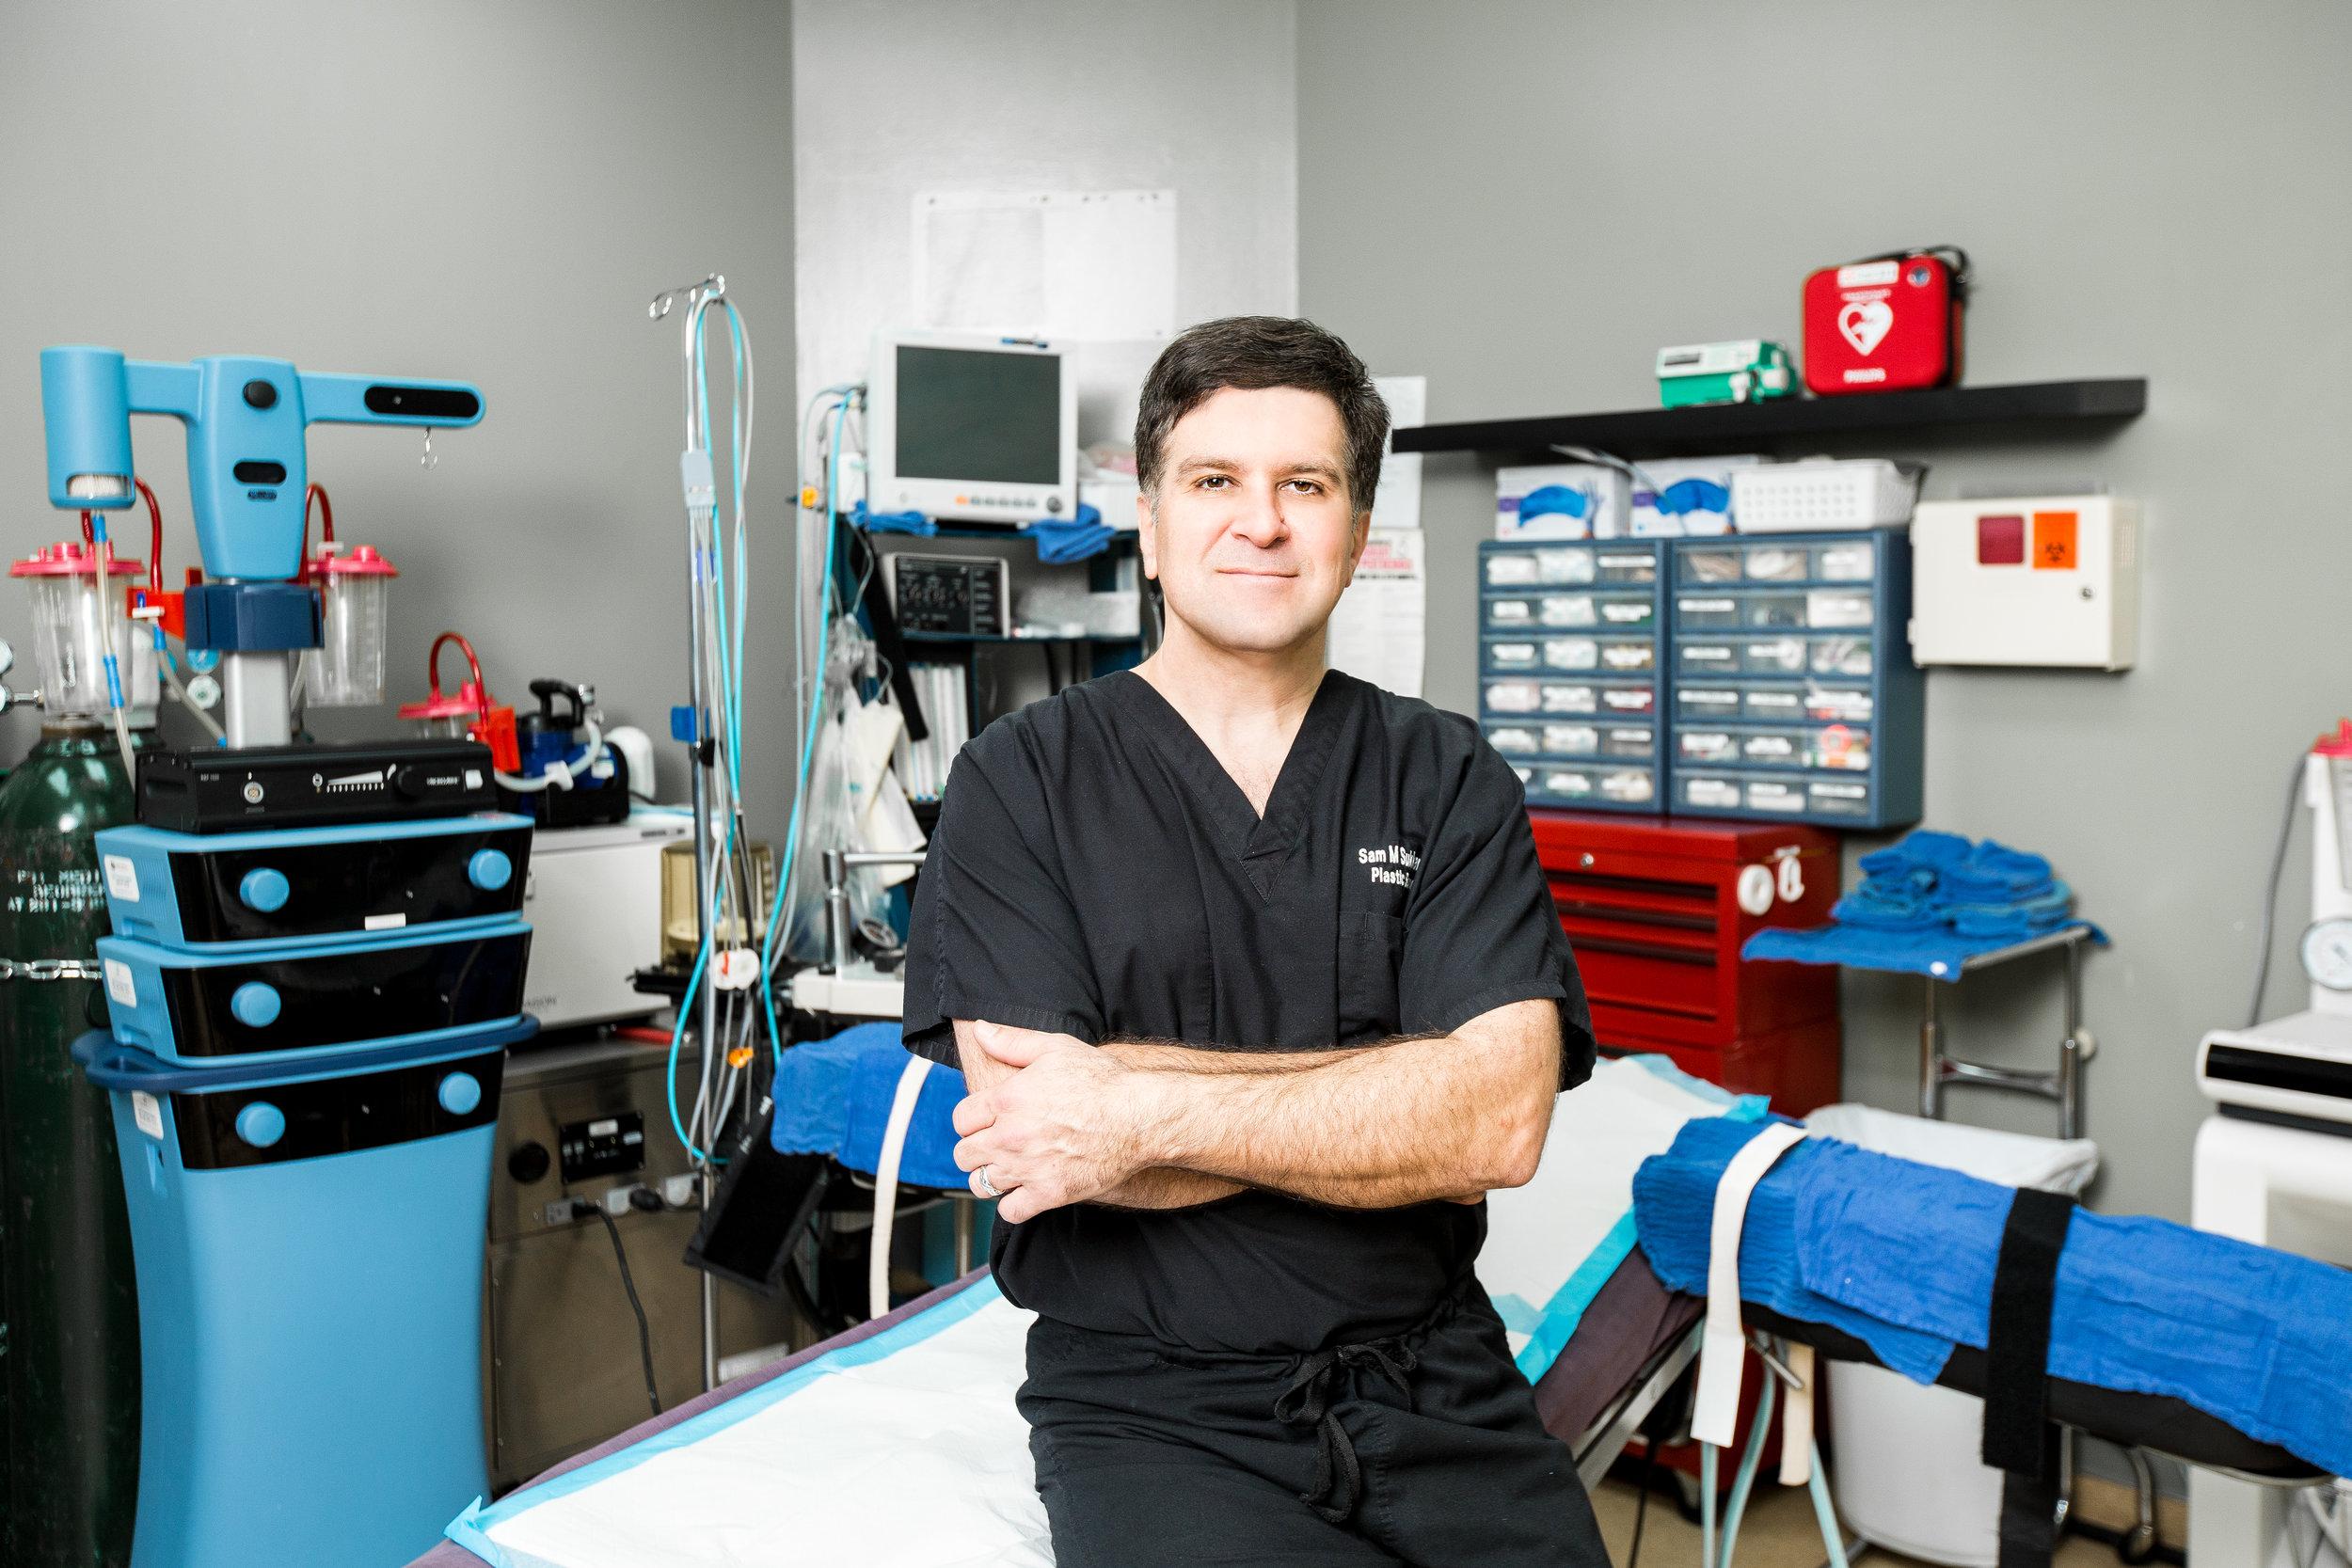 Dr. Sam Sukkar in his OR. Credit: Sam Sukkar.